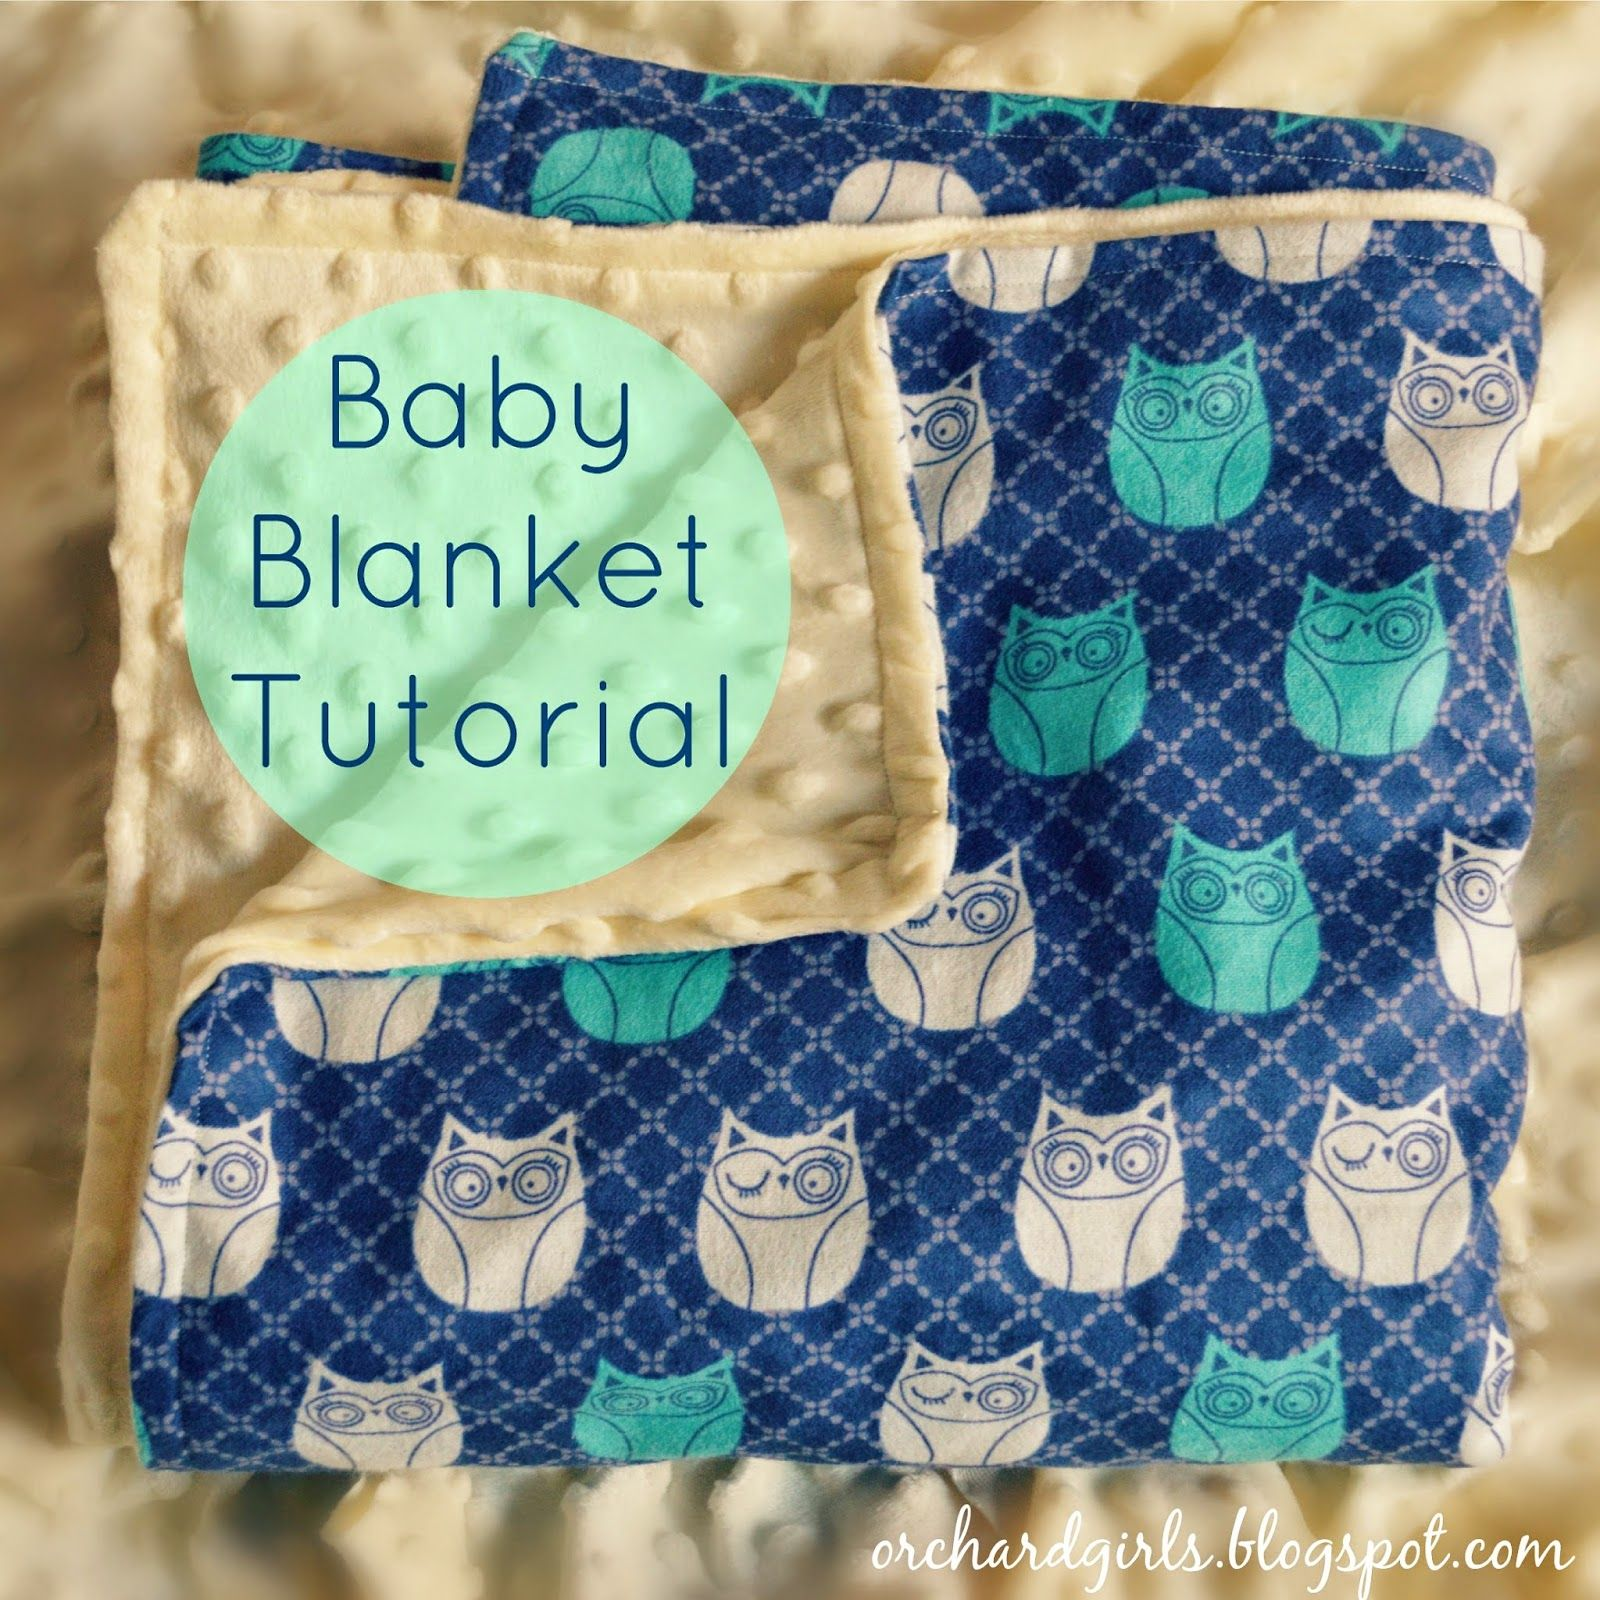 Super easy diy baby blanket tutorial with minky and cuddle fabric super easy diy baby blanket tutorial with minky and cuddle fabric jeuxipadfo Gallery